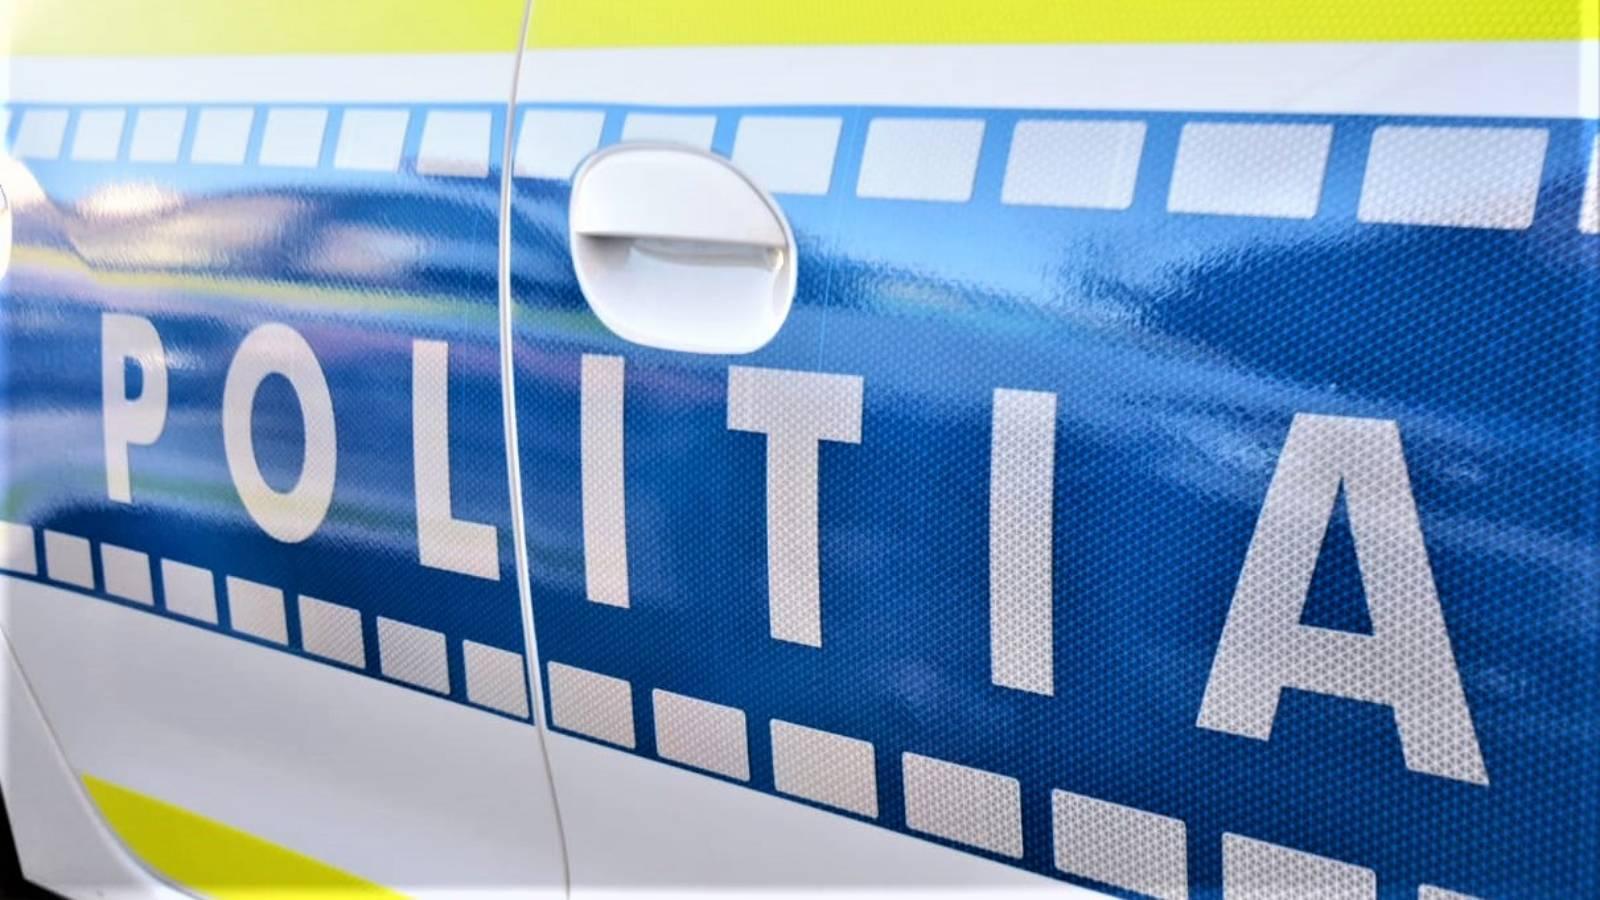 Politia Romana soferi corecti